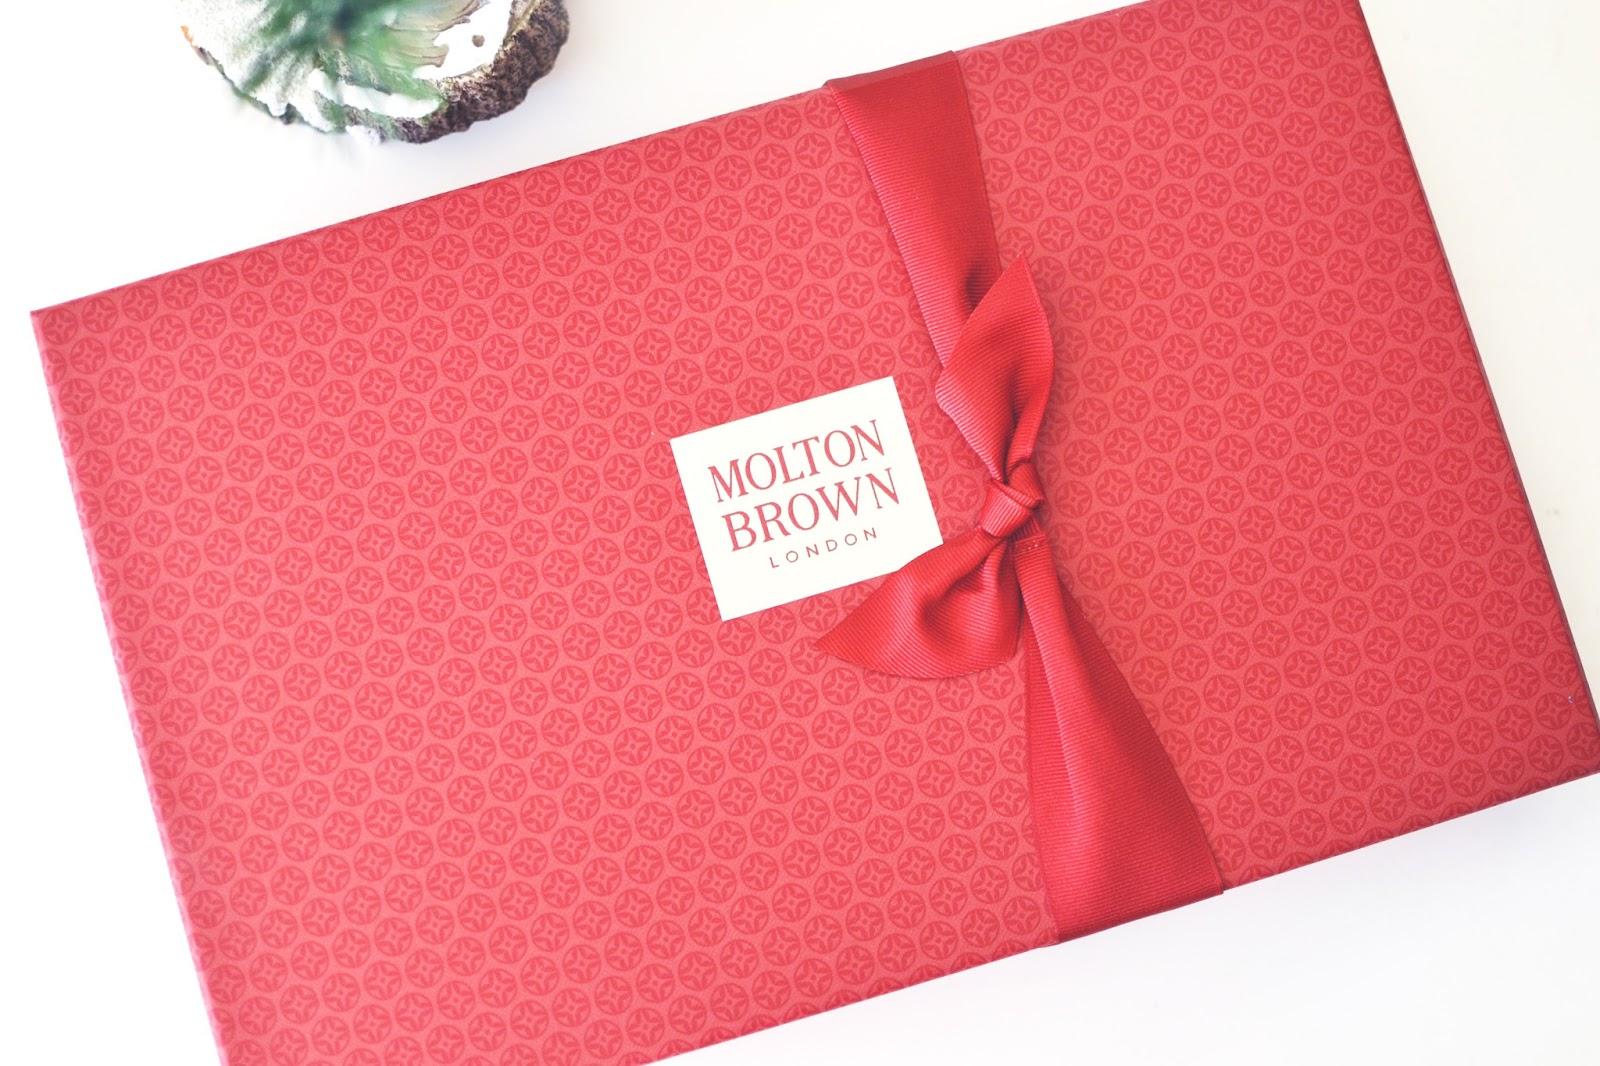 Molton Brown gift set, molton brown body wash